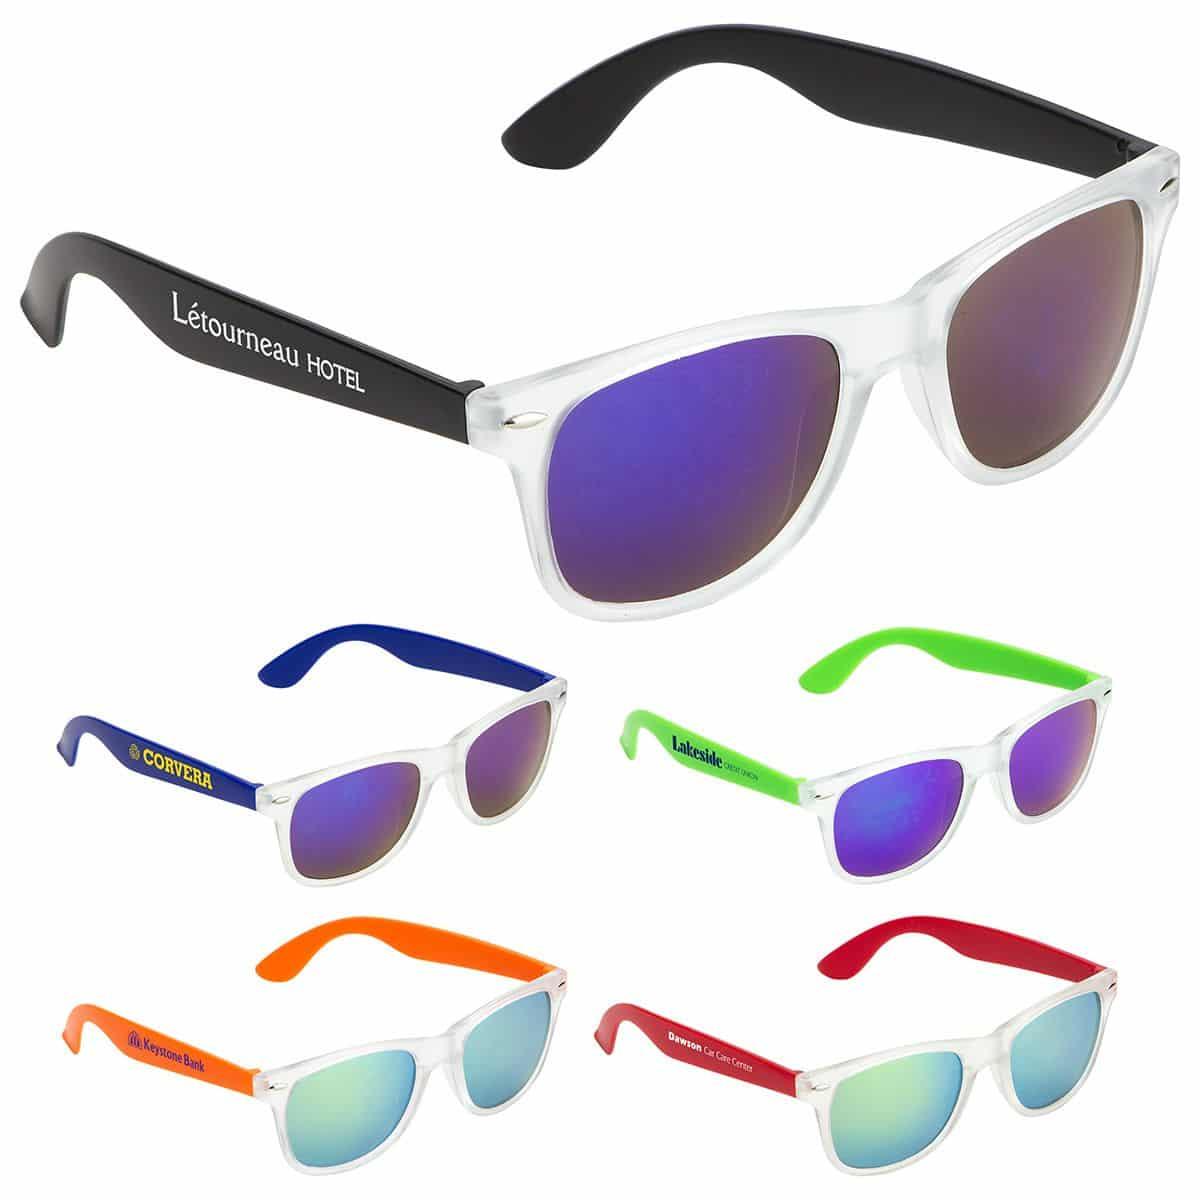 Mirrored Promotional Sunglasses